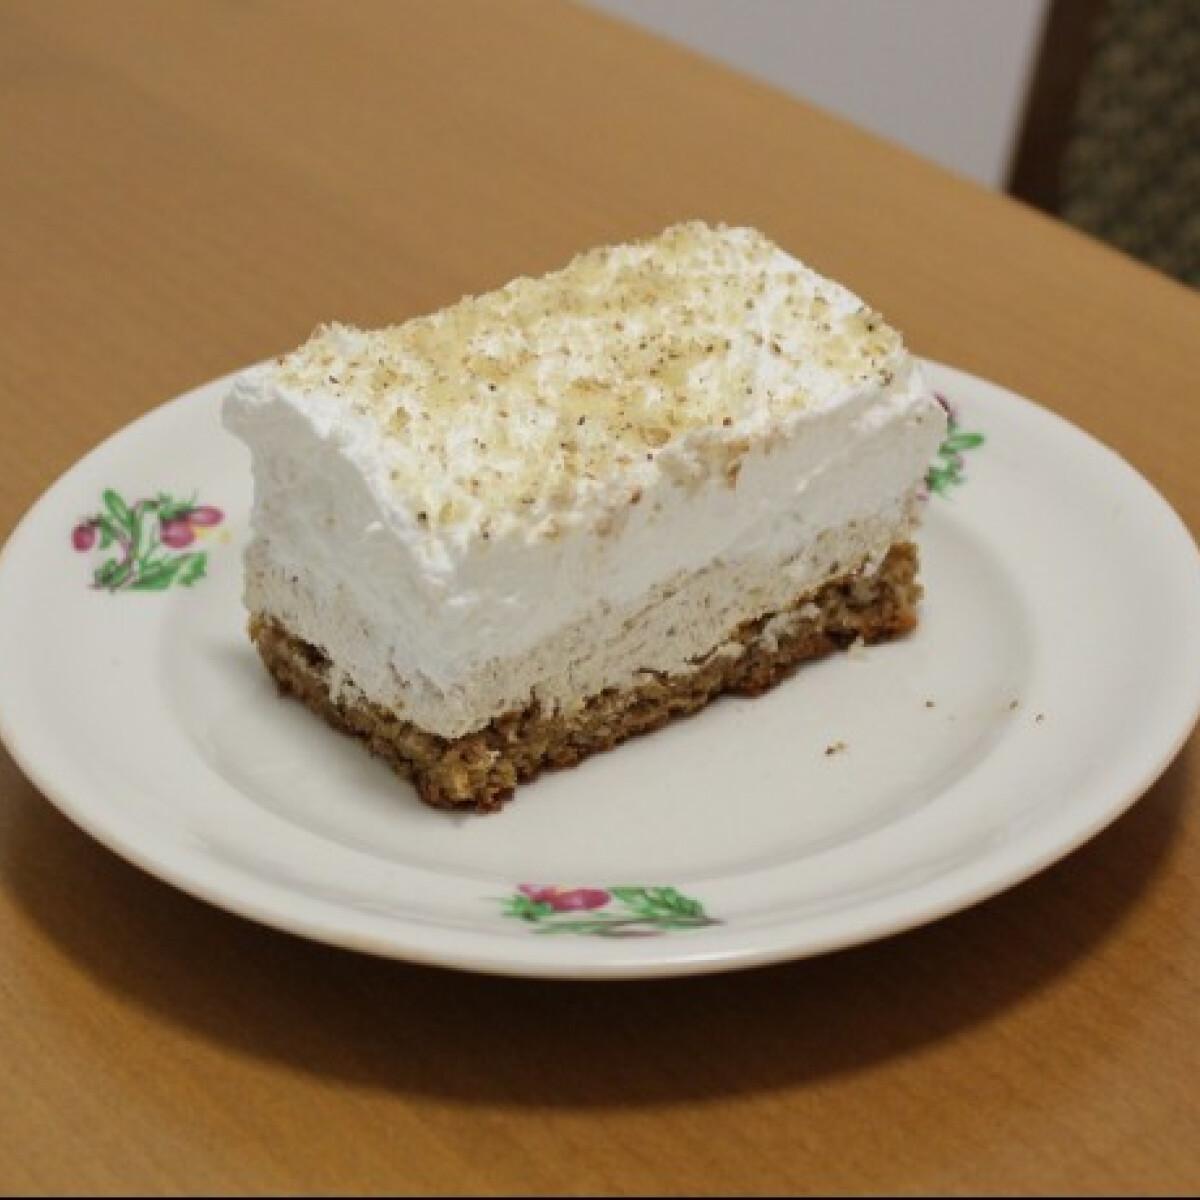 Habos diós sütemény Magdolna konyhájából